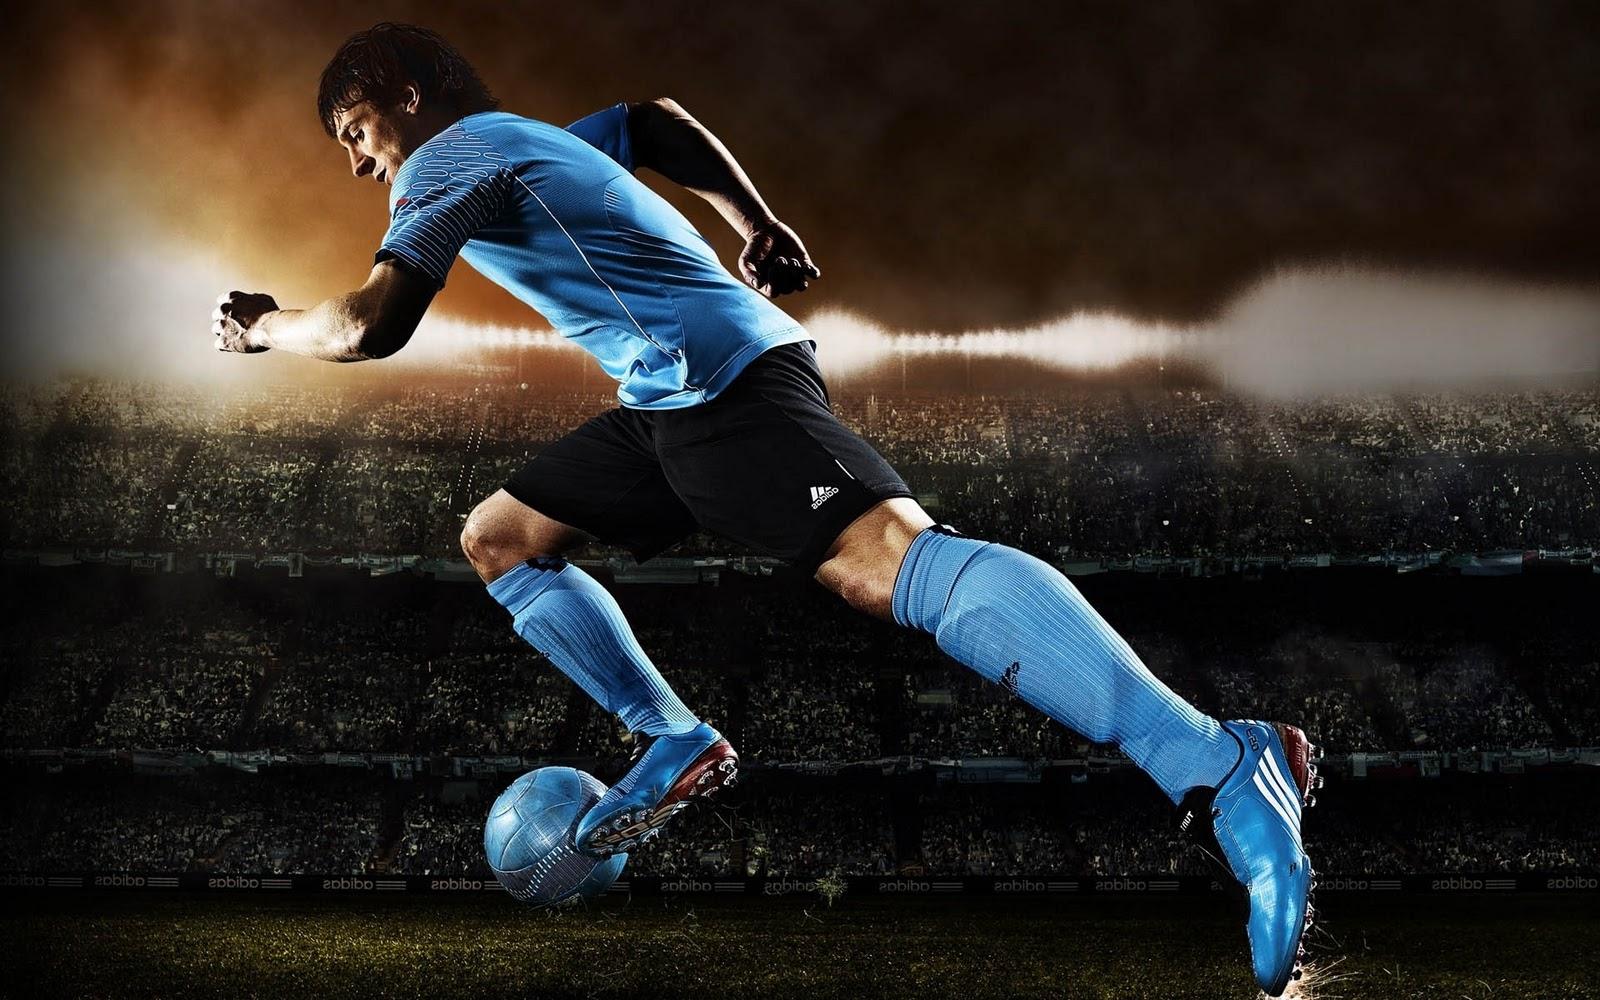 Best Desktop HD Wallpaper - Sport Wallpaper